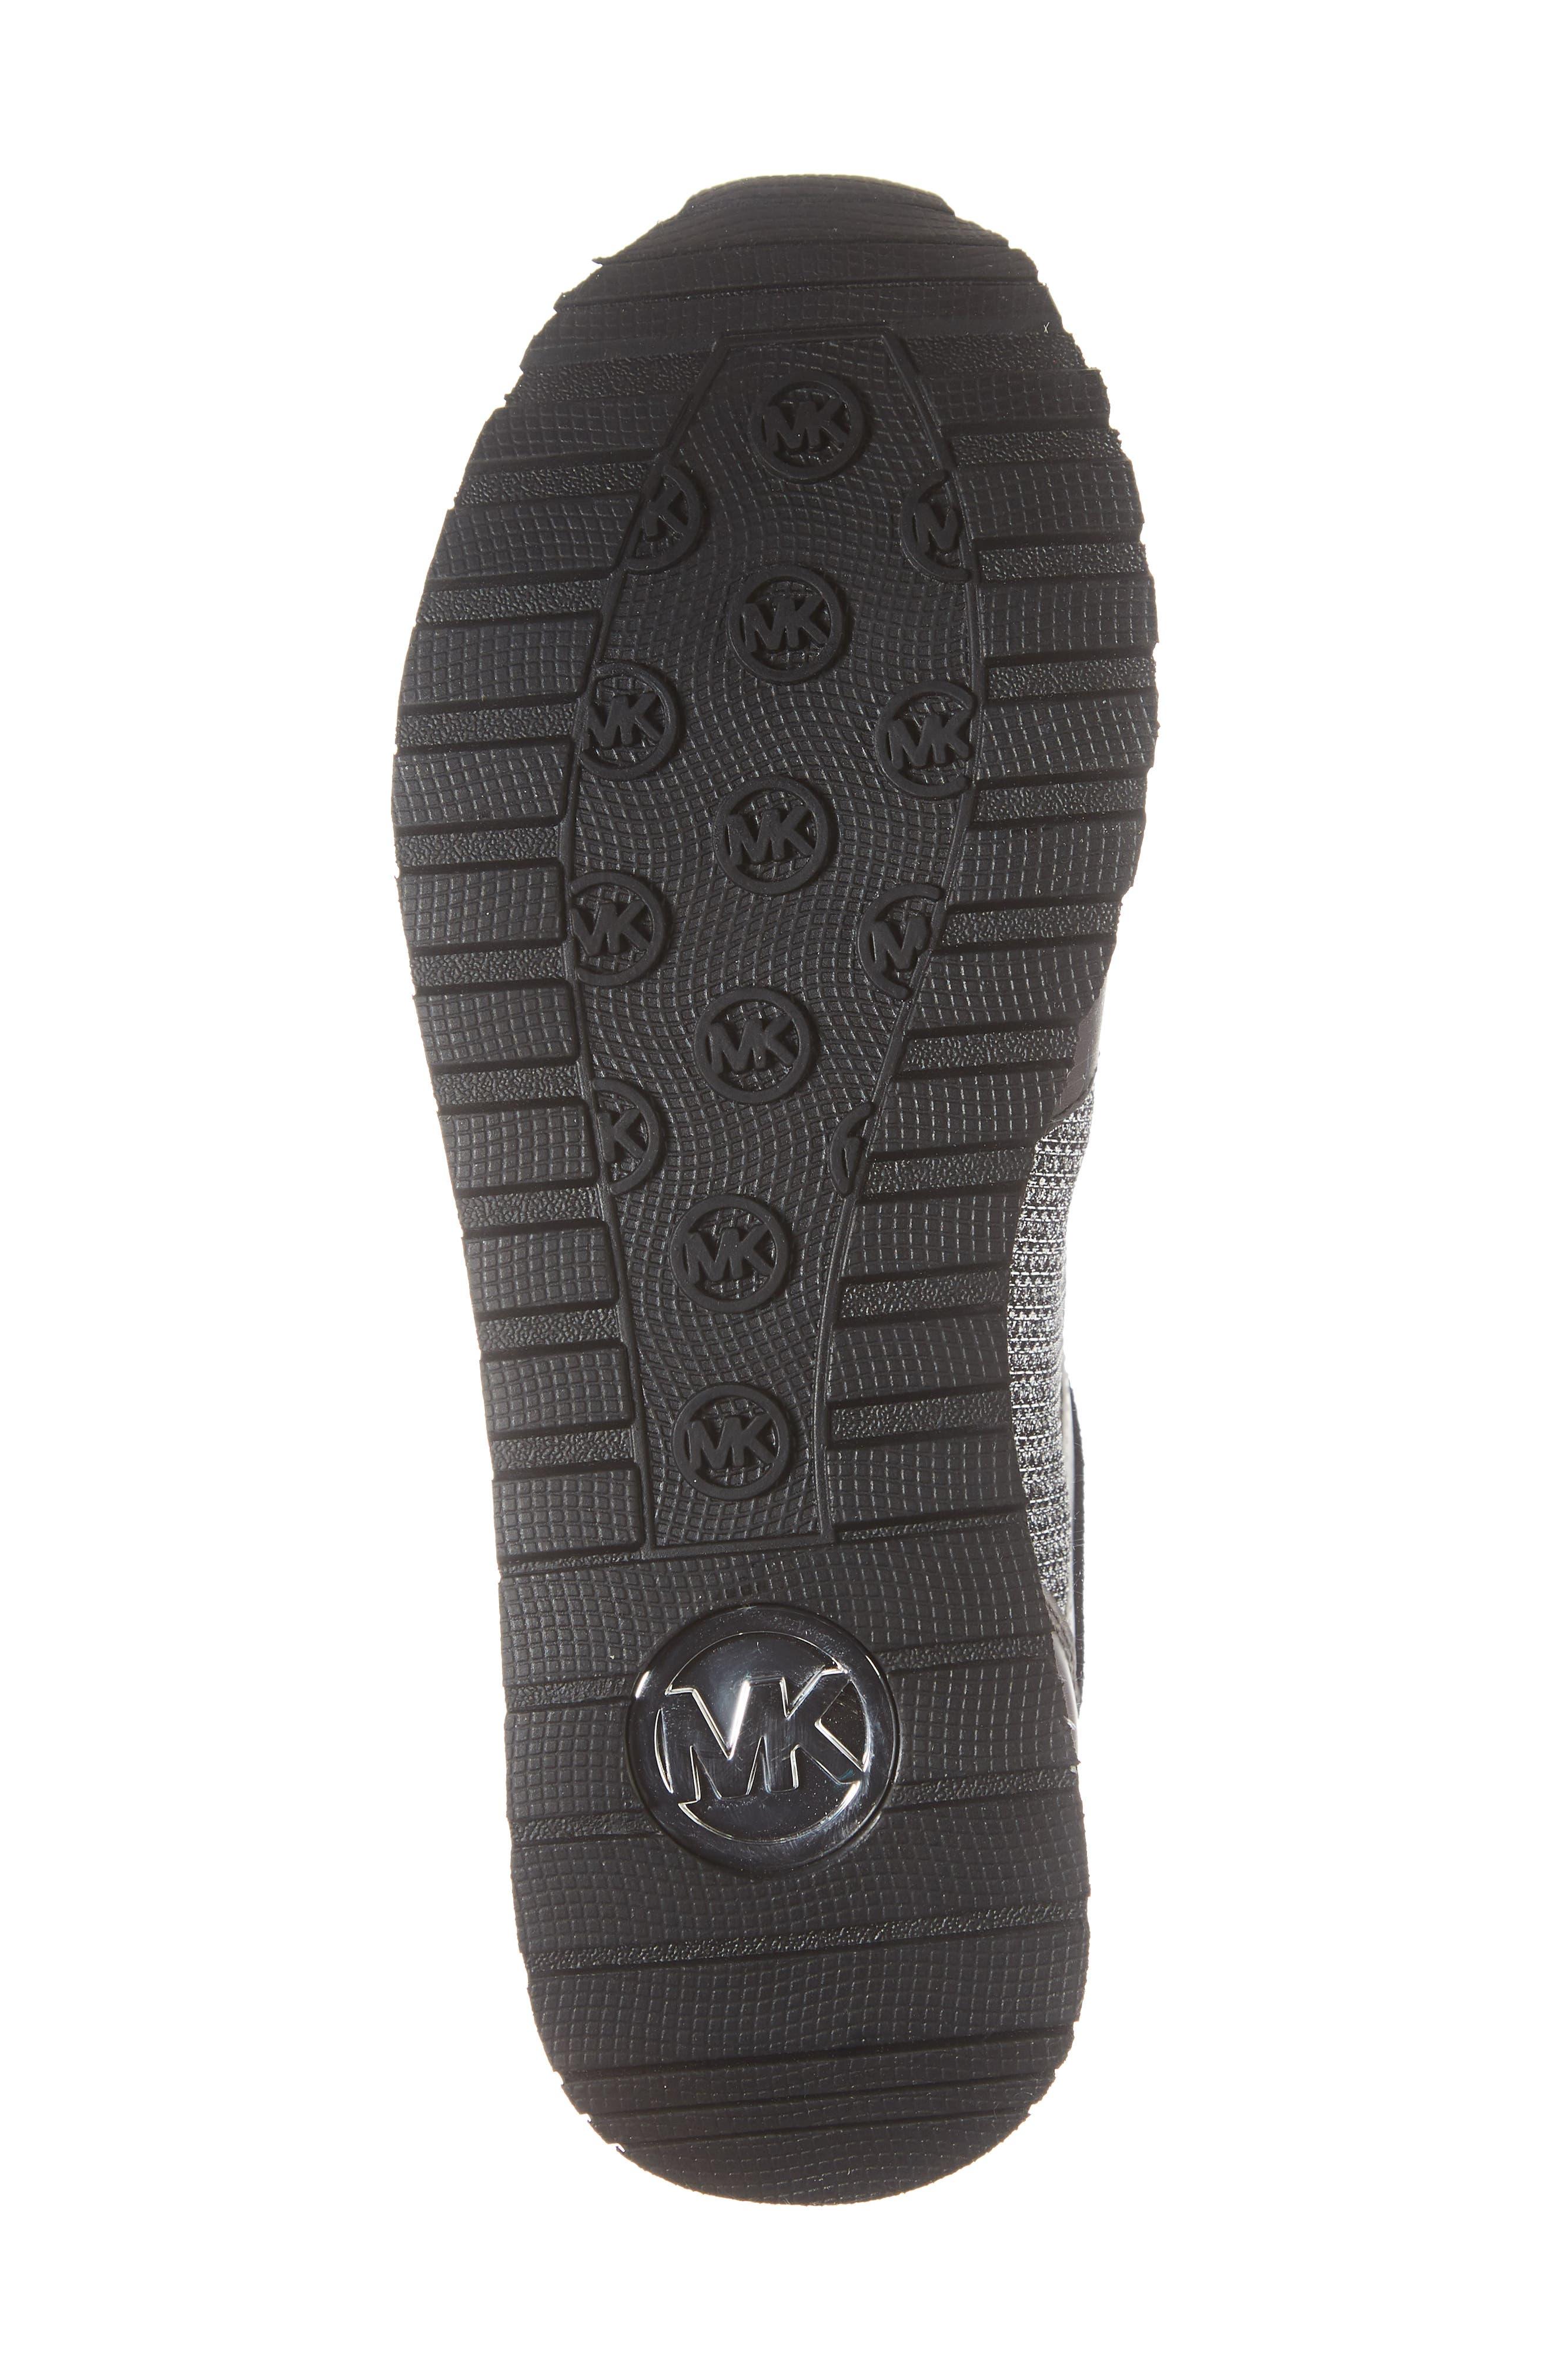 Billie Perforated Sneaker,                             Alternate thumbnail 5, color,                             Black/ Silver